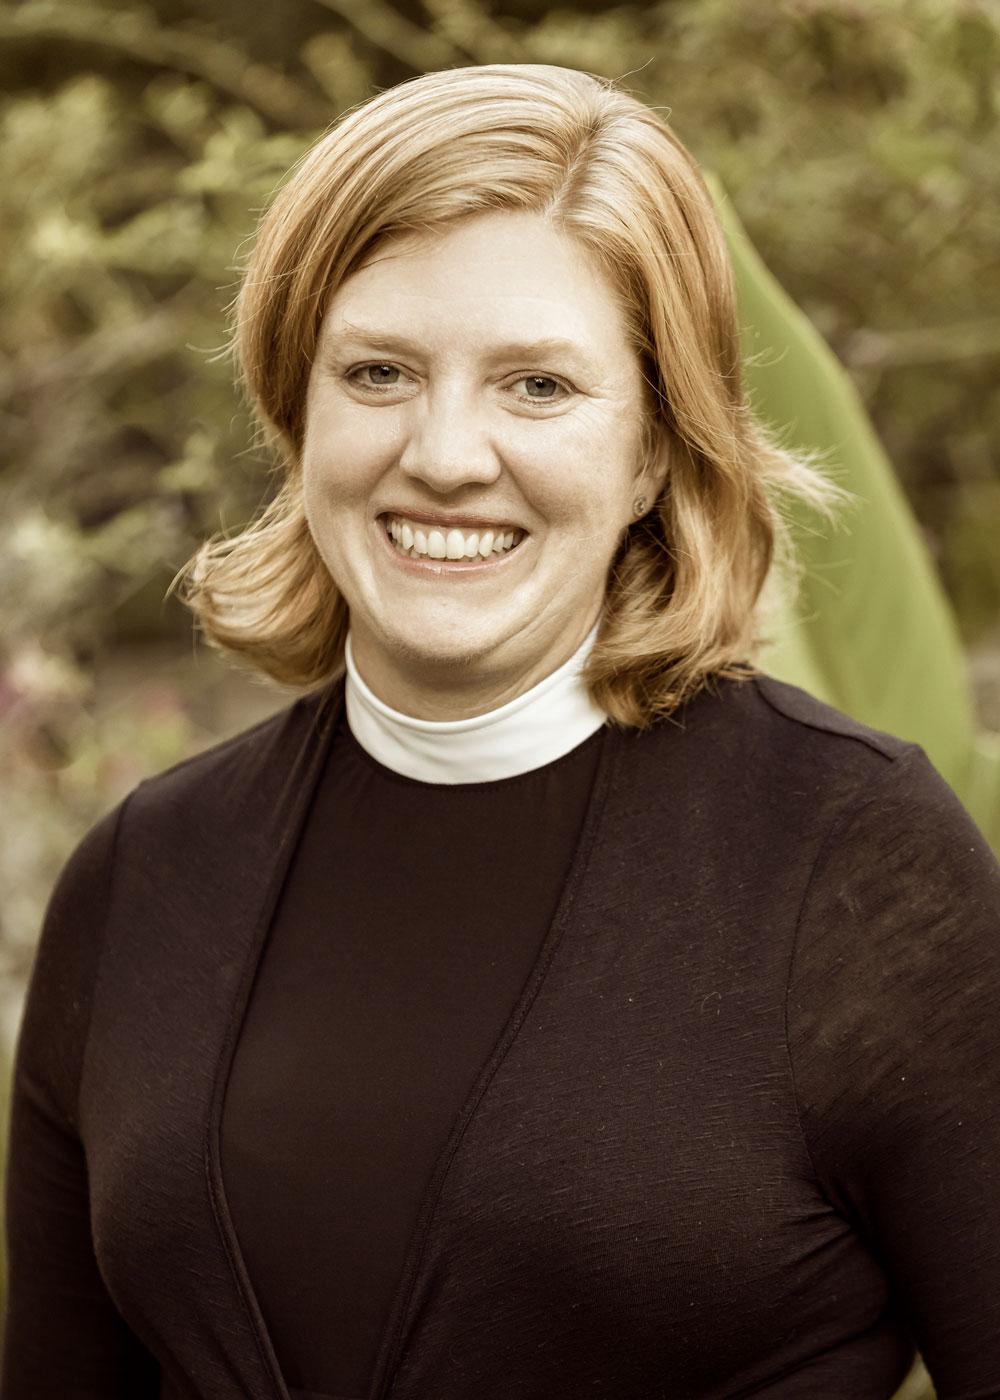 The Reverend Courtney Davis-Shoemaker